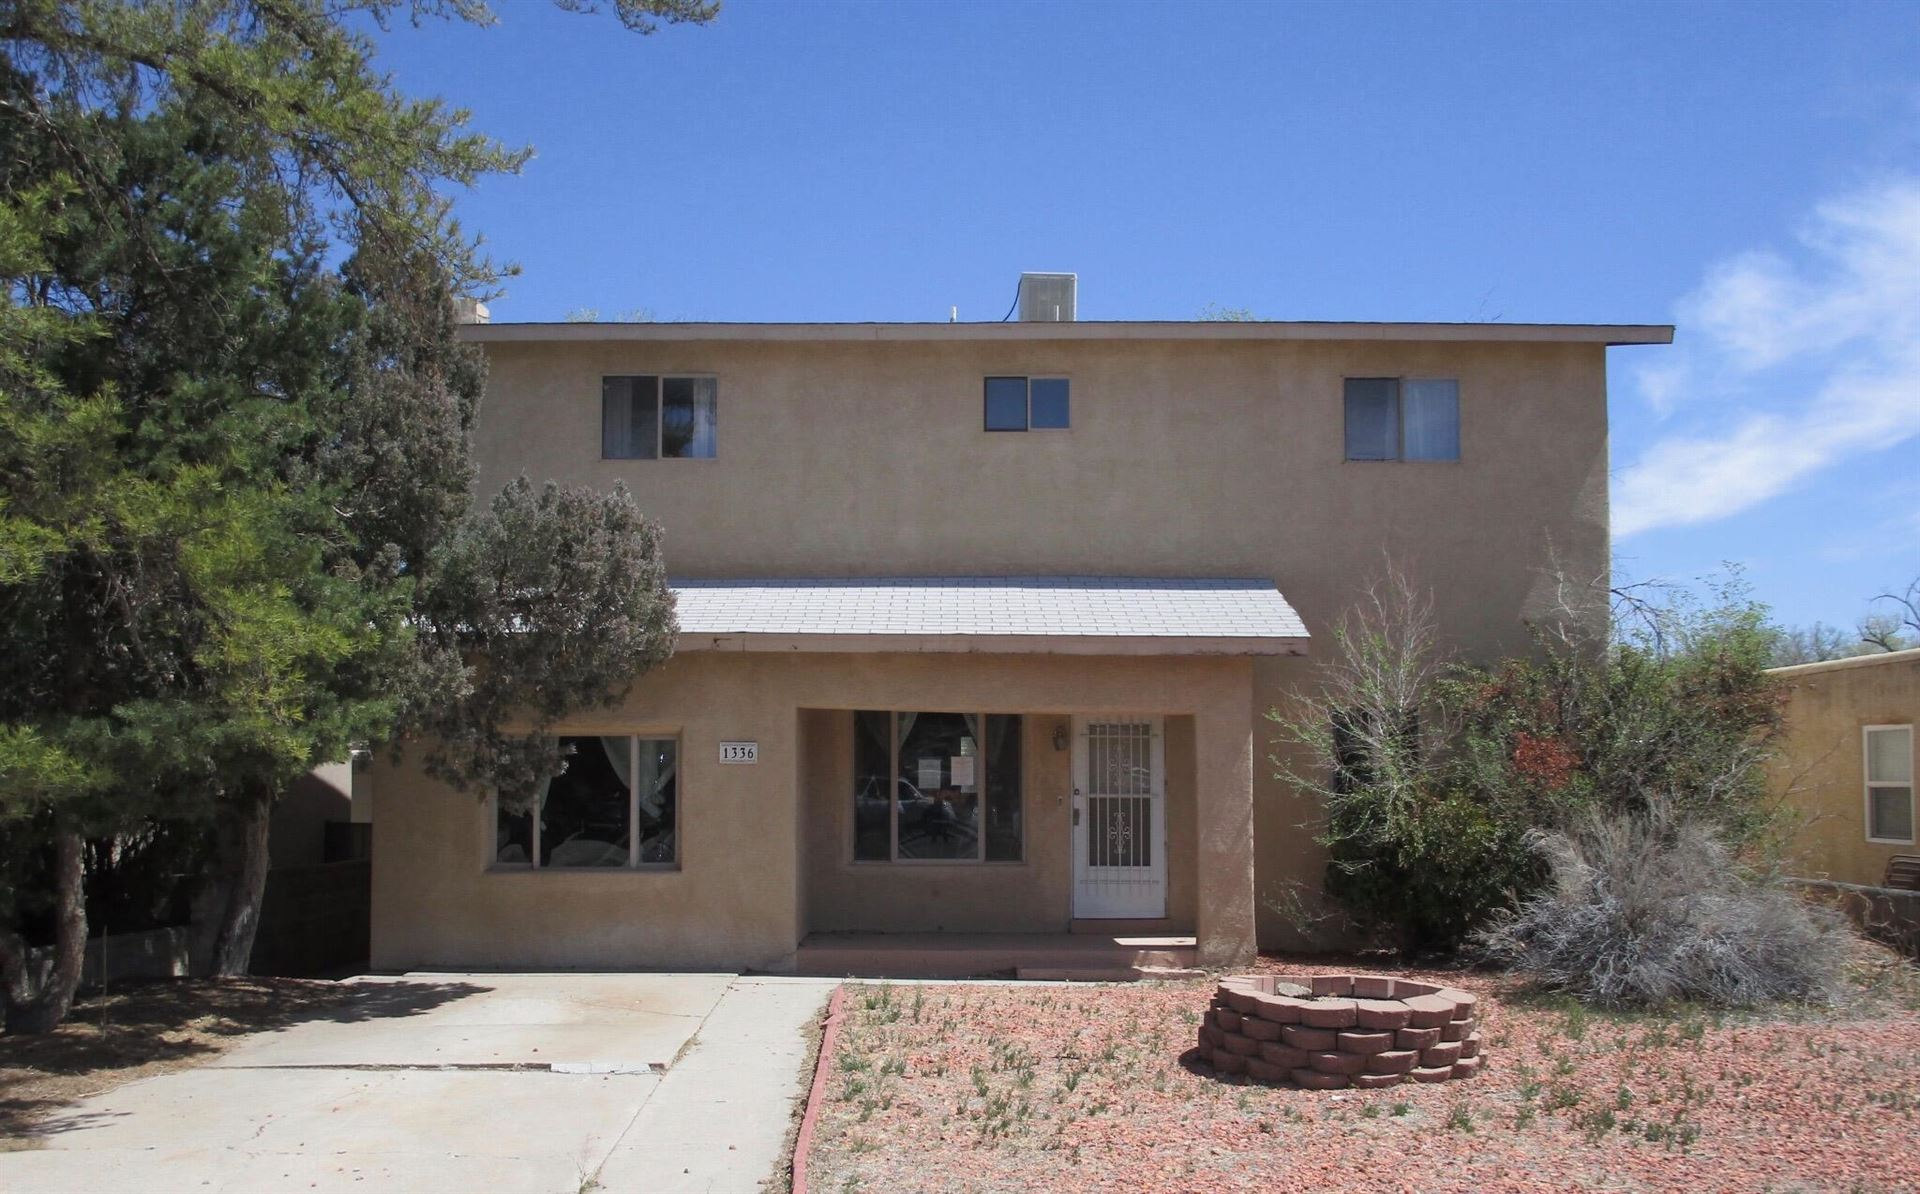 1336 PRINCETON Drive NE, Albuquerque, NM 87106 - MLS#: 989633